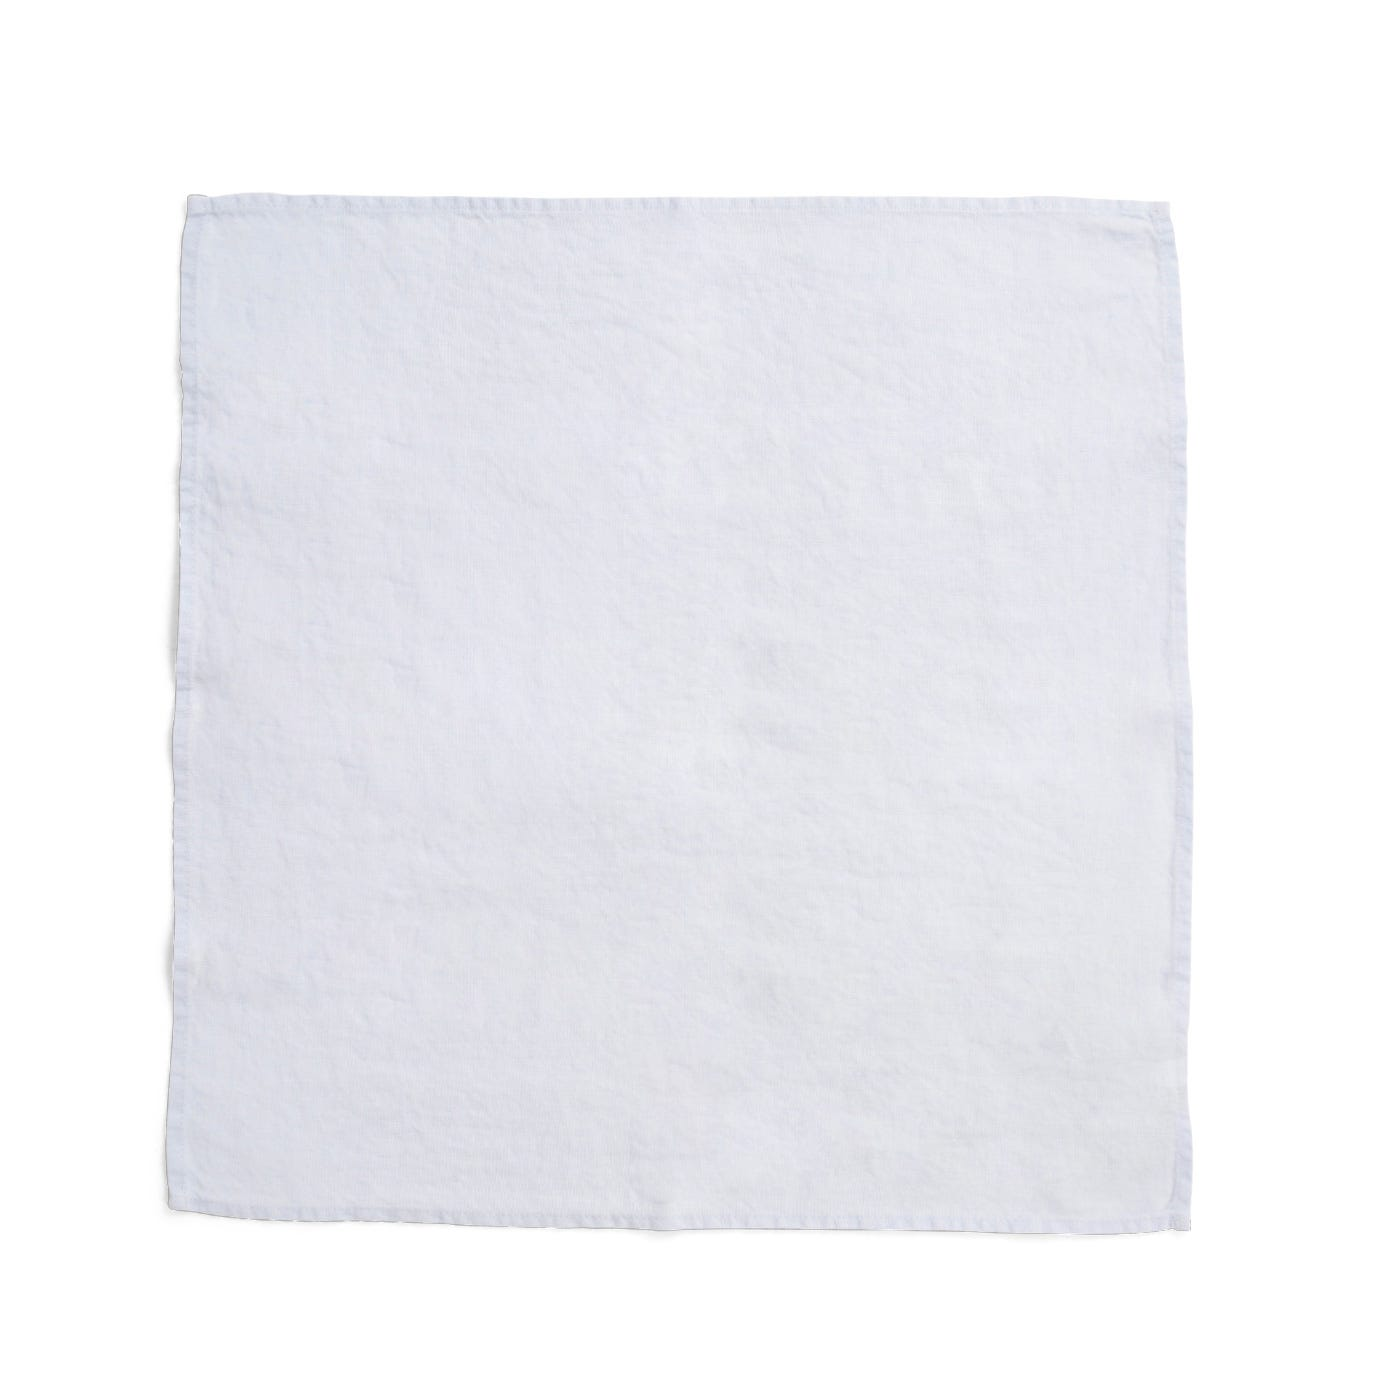 Heal's Heal's Linen Napkin Powder Blue